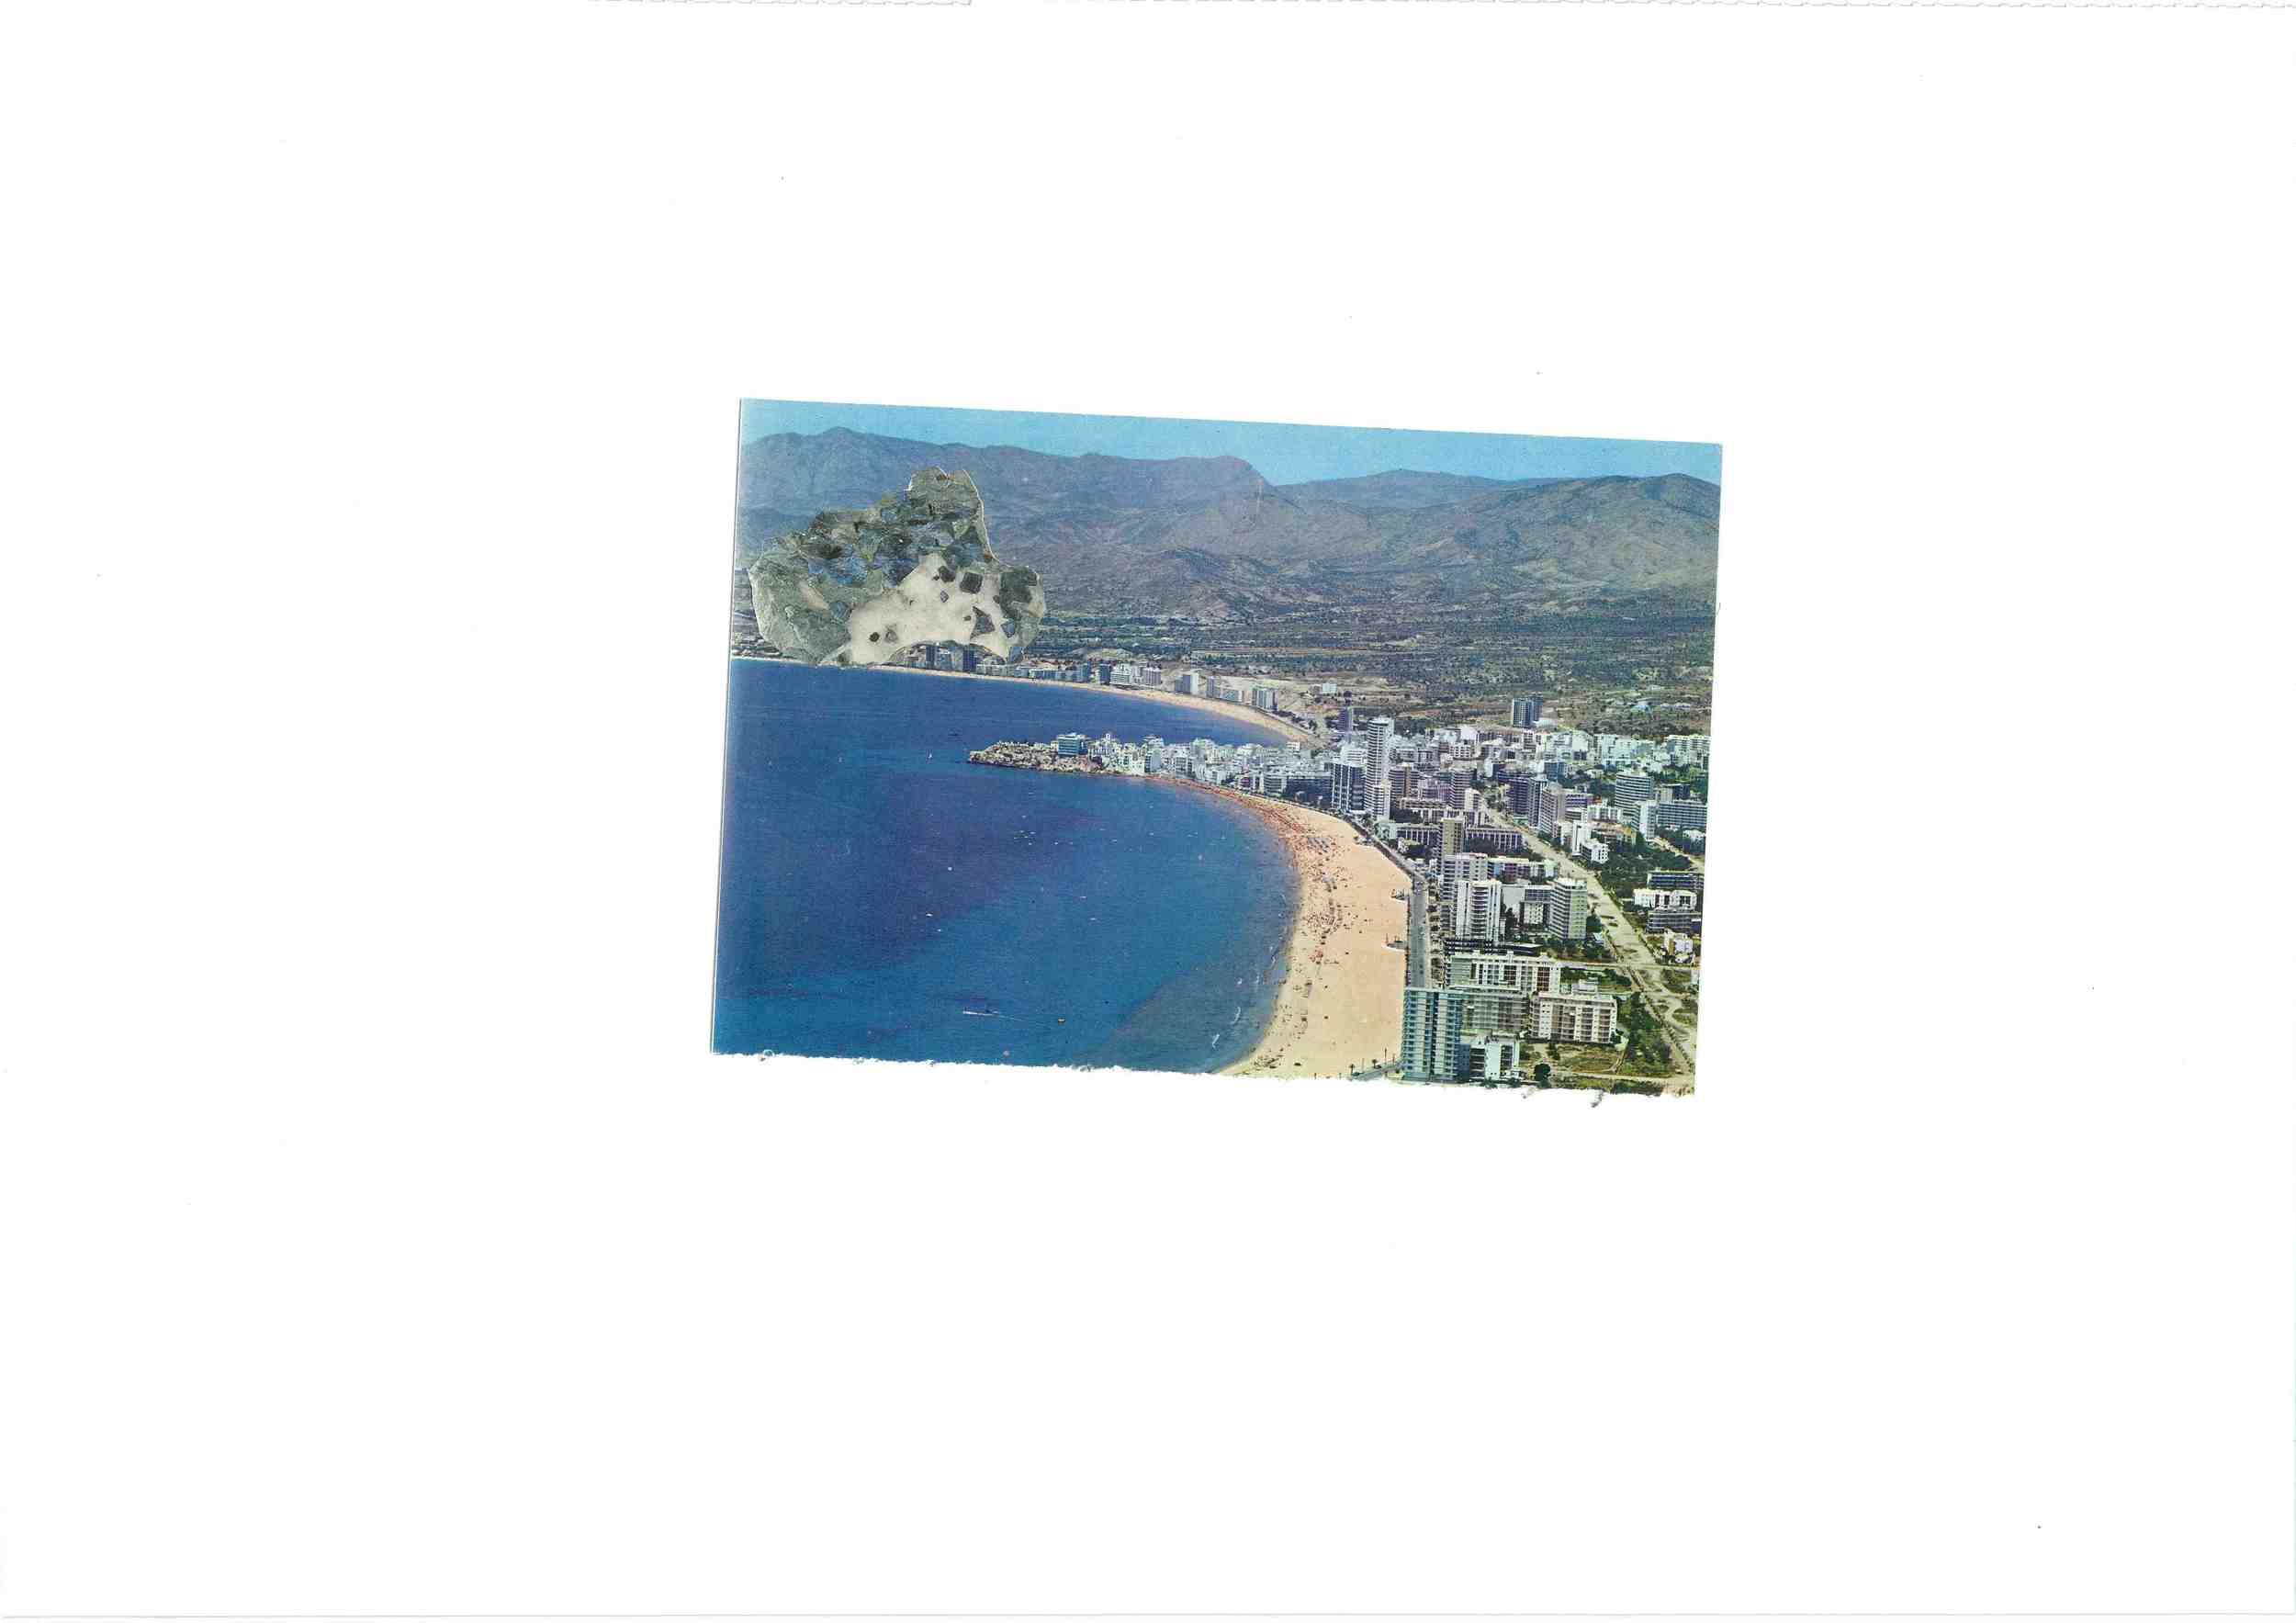 Blue Gem Resort